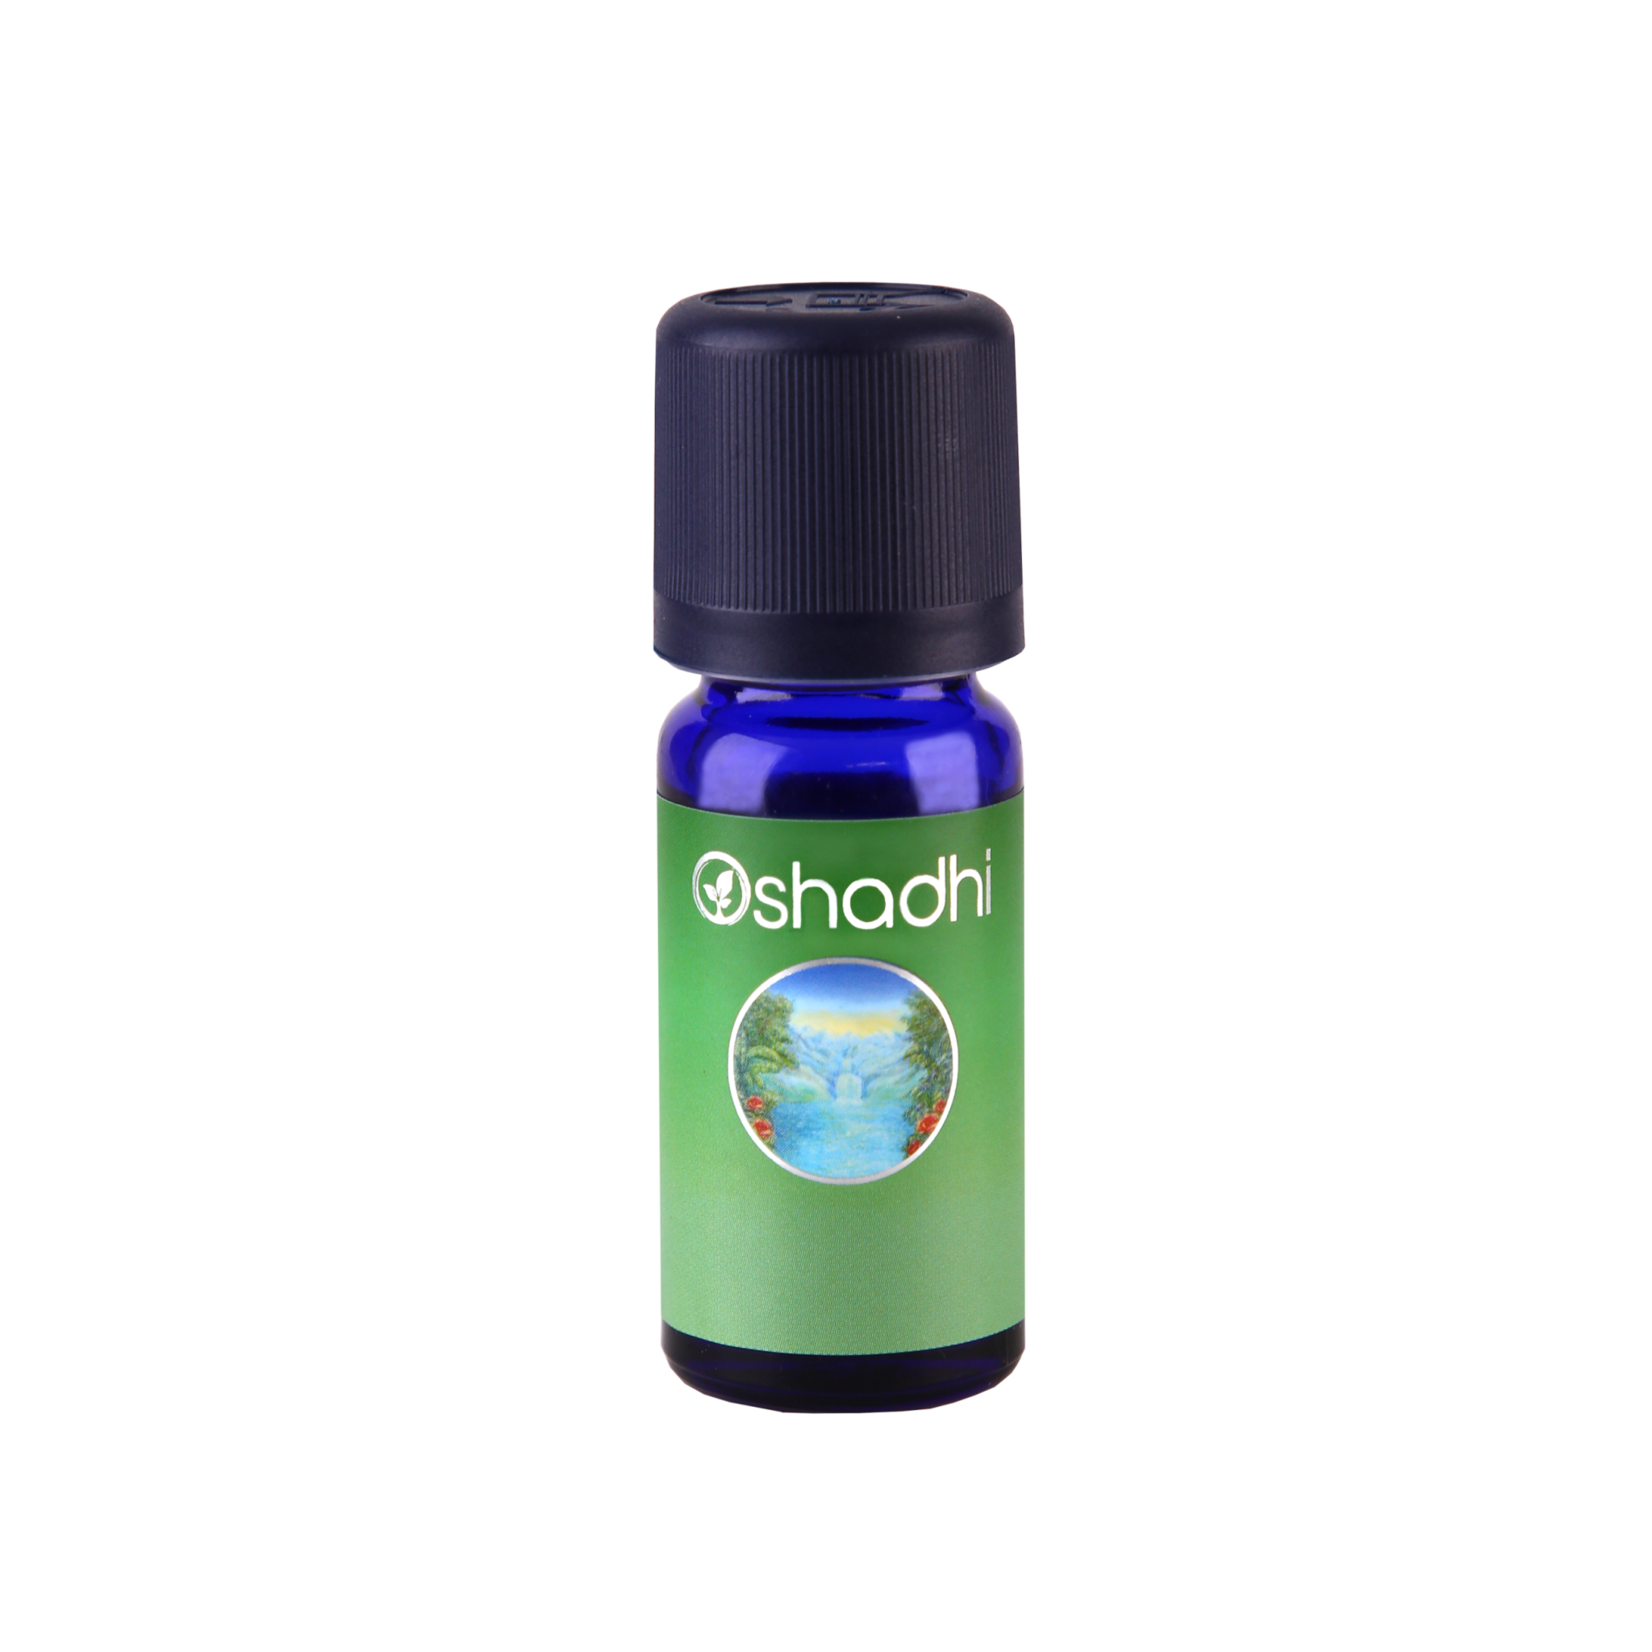 Oshadhi Bestseller Synergie Kinderdromen Oshadhi - geurig slaapliedje